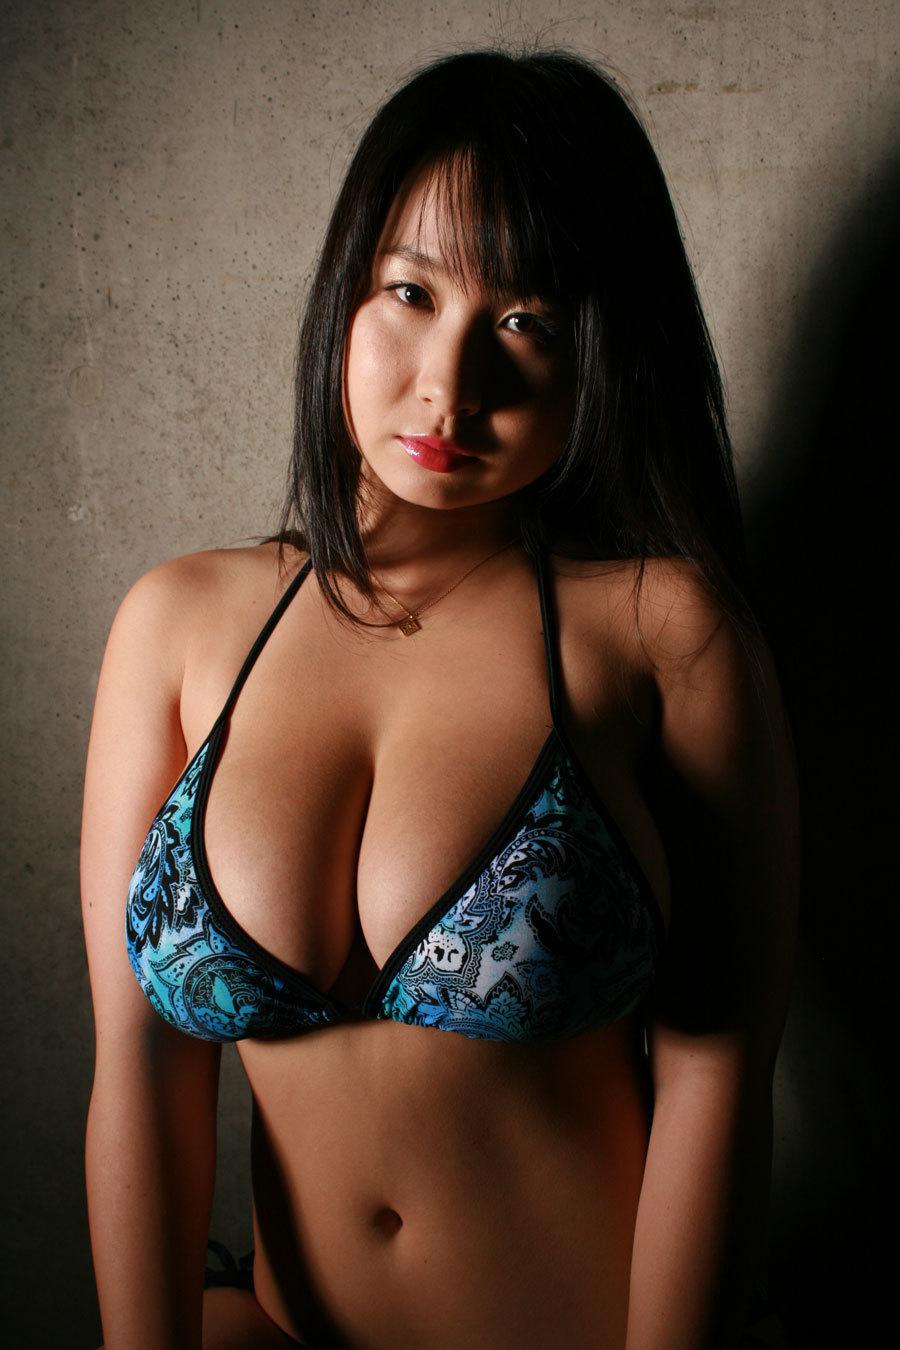 kiriyama_rui320.jpg